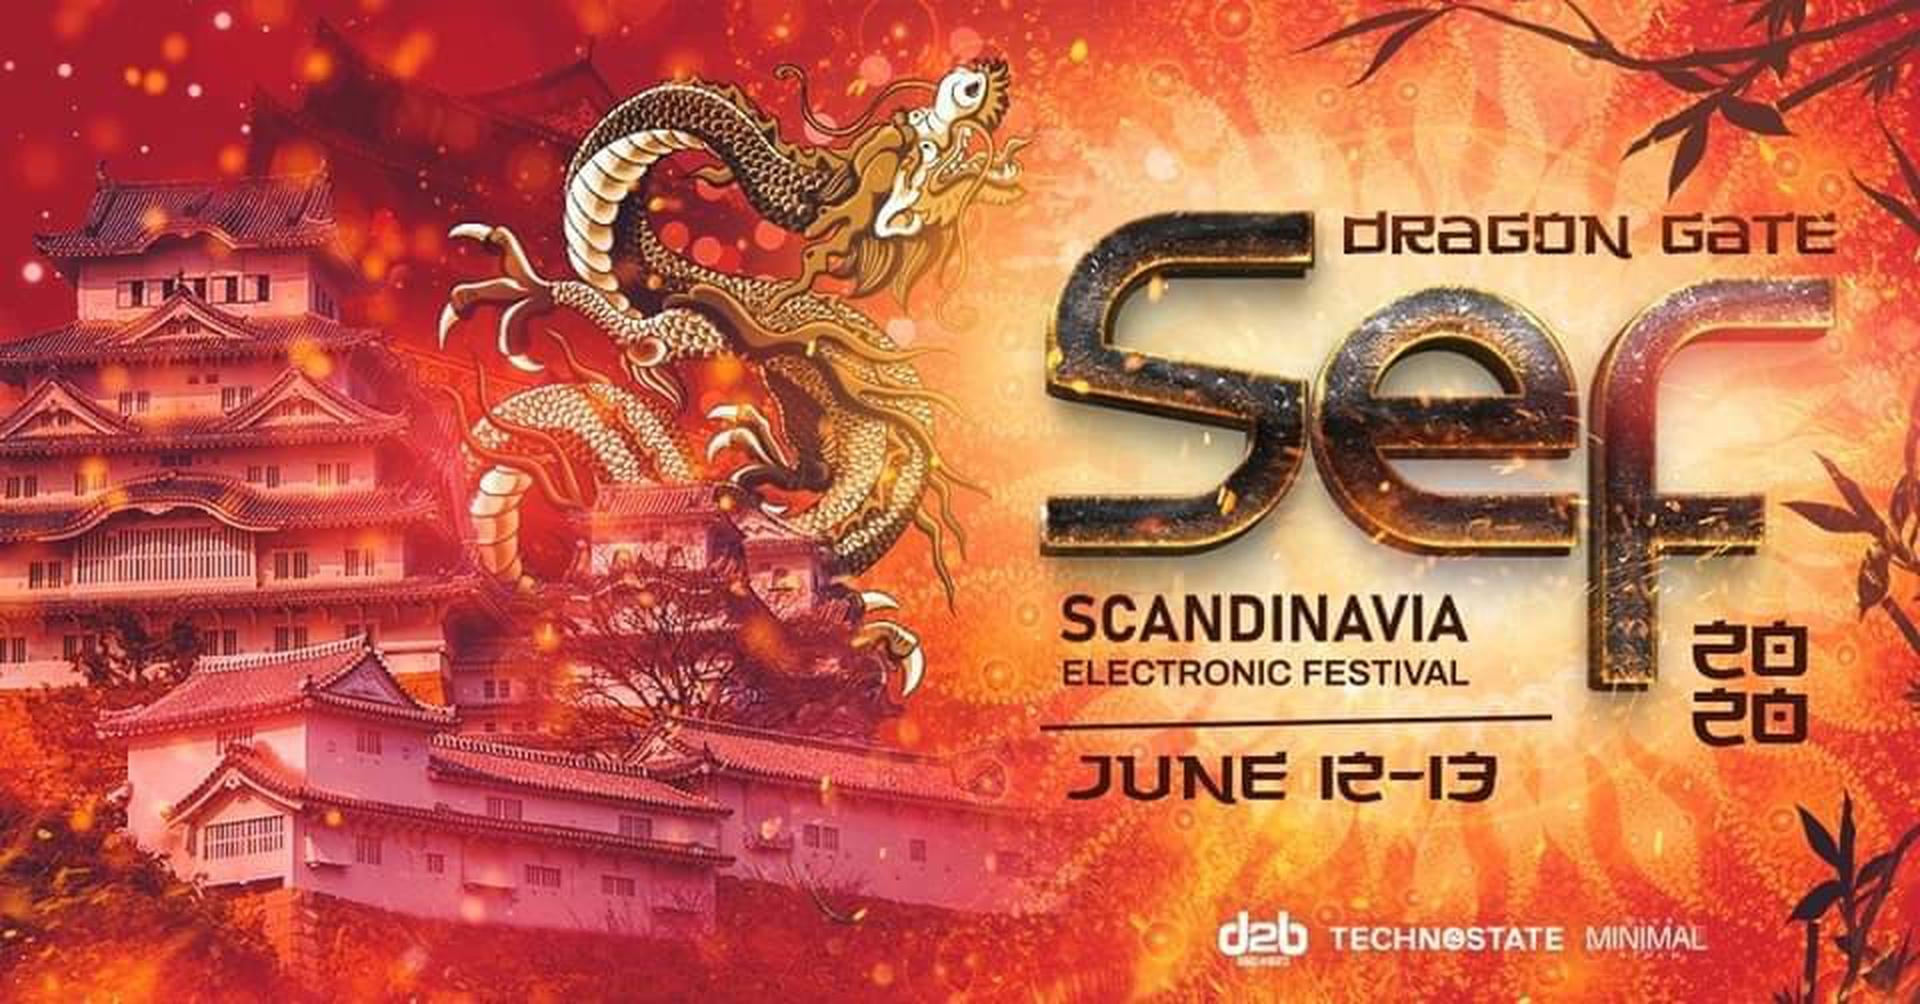 Event: Scandinavia Electronic Festival 2022 - Return Of The Dragon